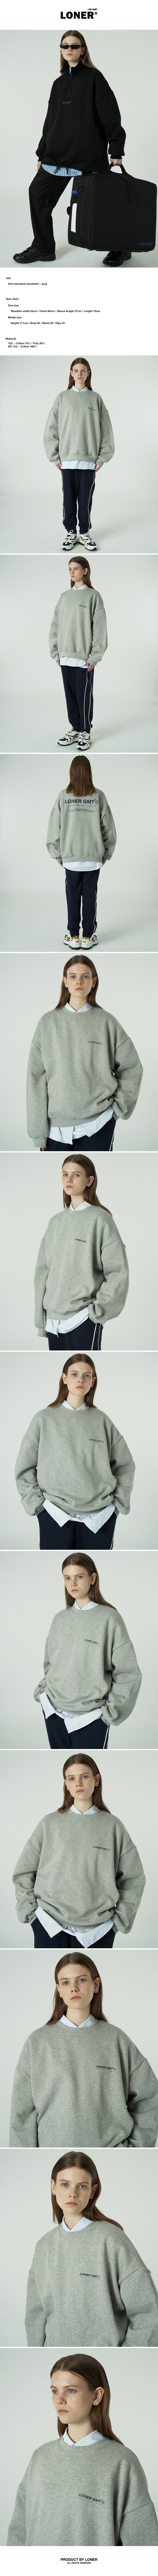 Gmt standard sweatshirt-grey.jpg